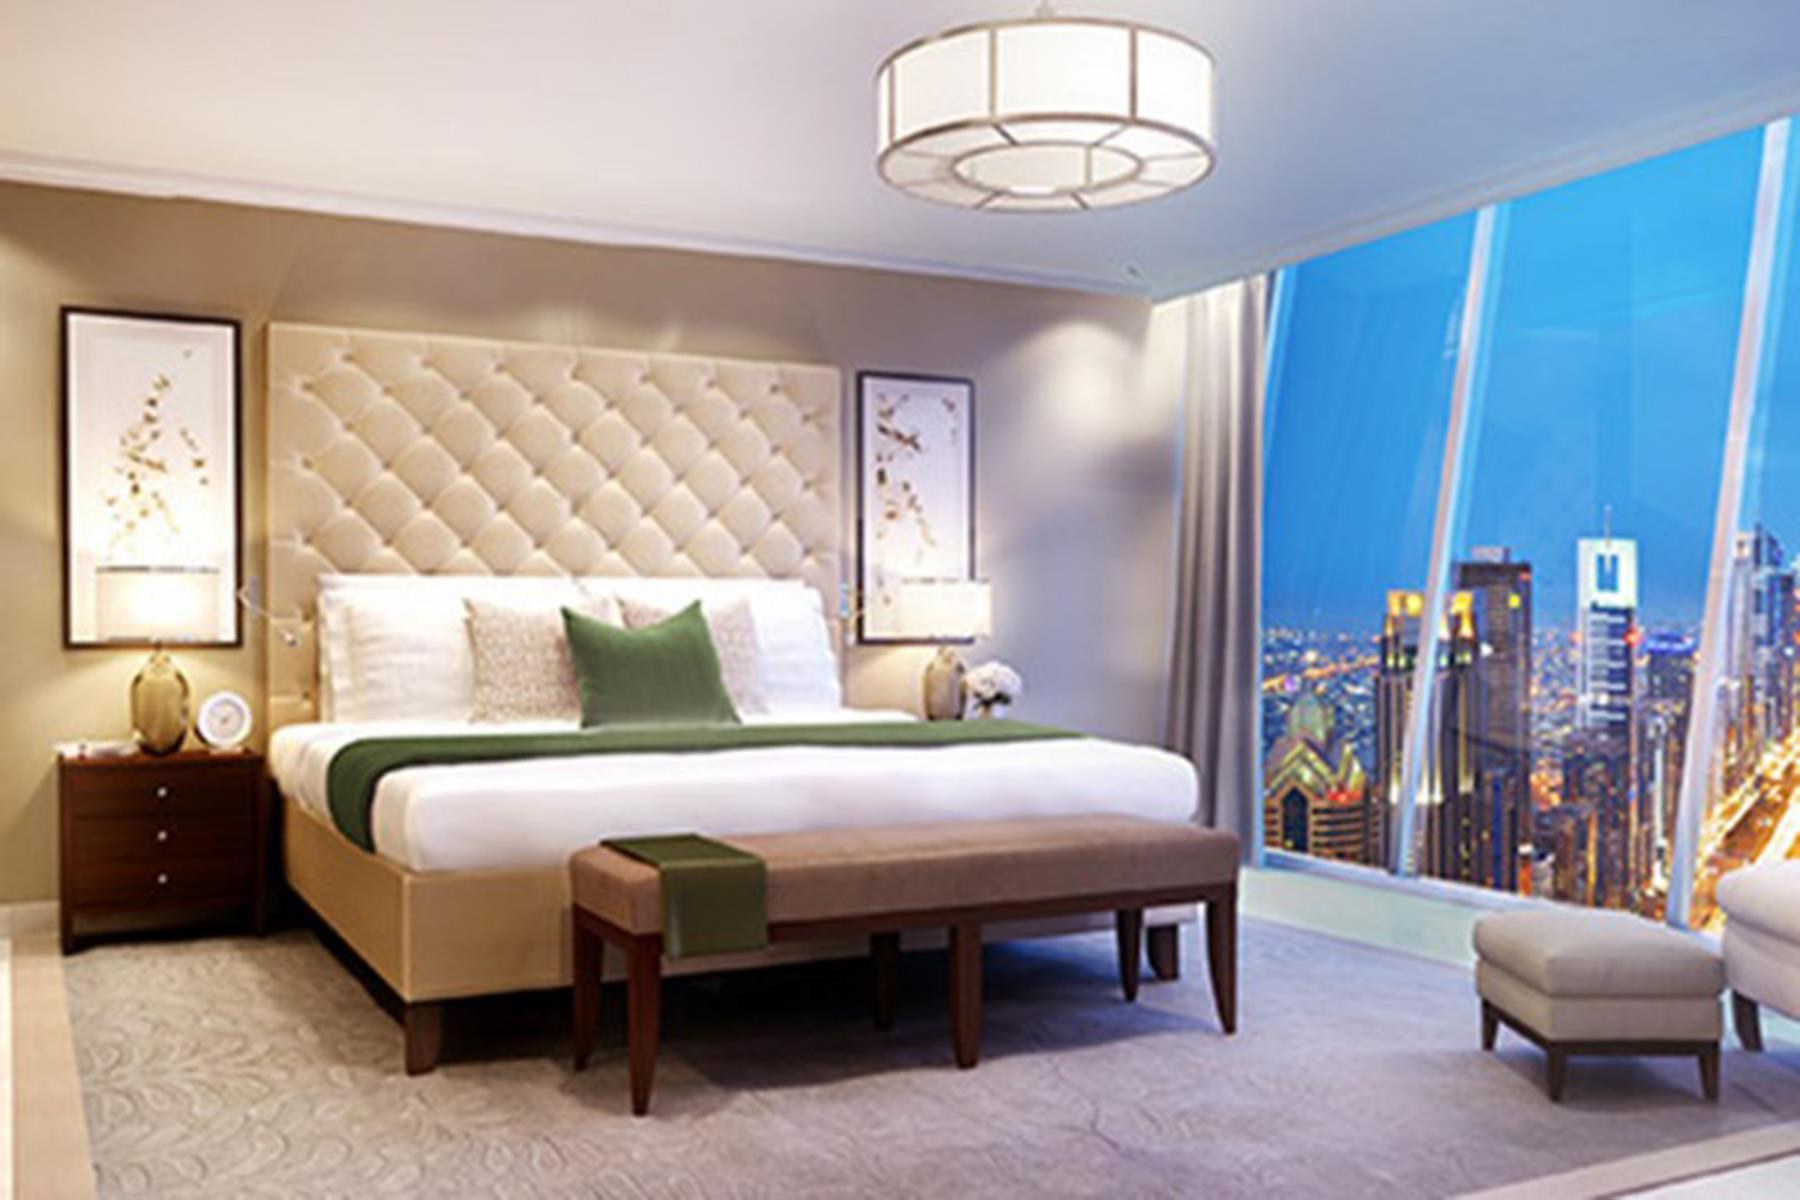 3 Bedroom | Full Burj and Fountain Views